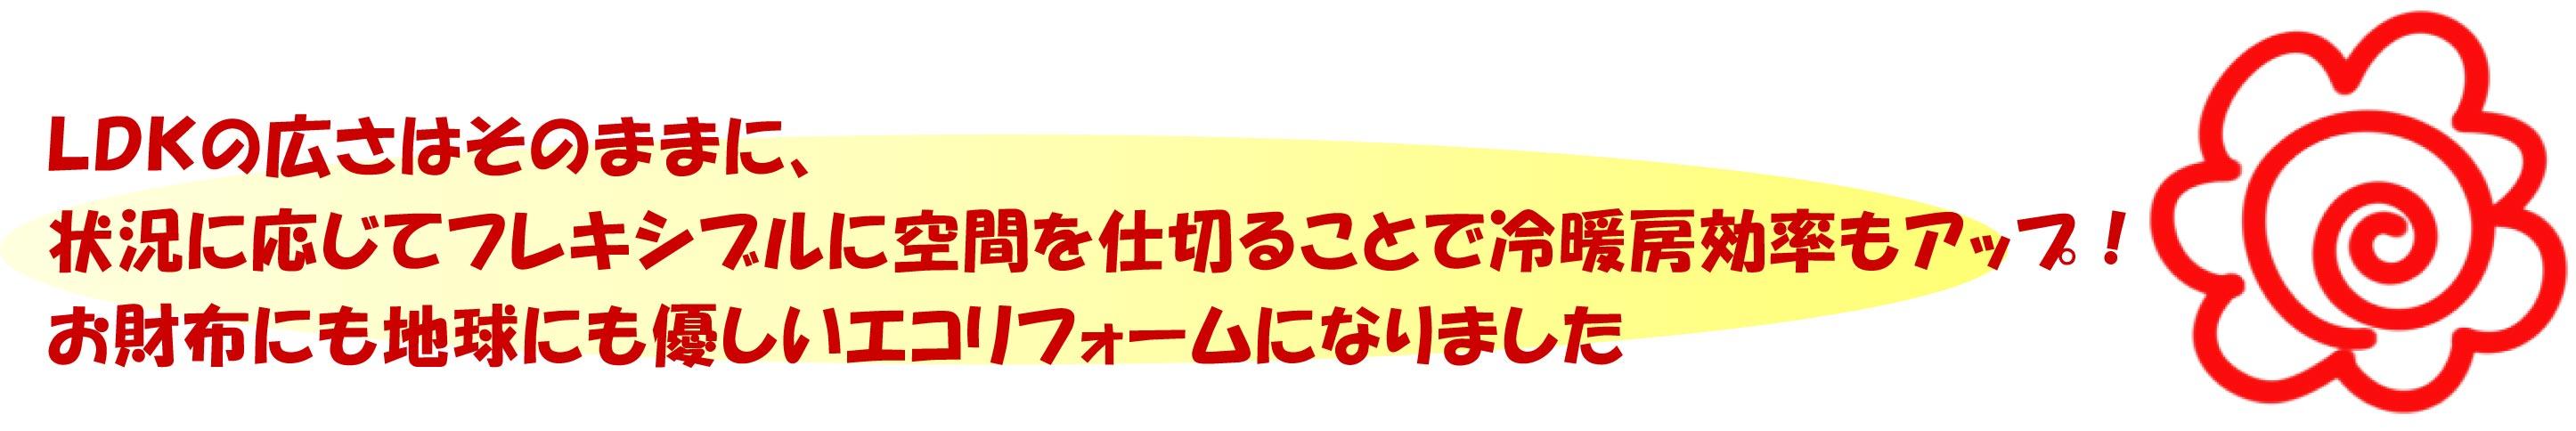 KuraSi-natu-sin79-11.jpg